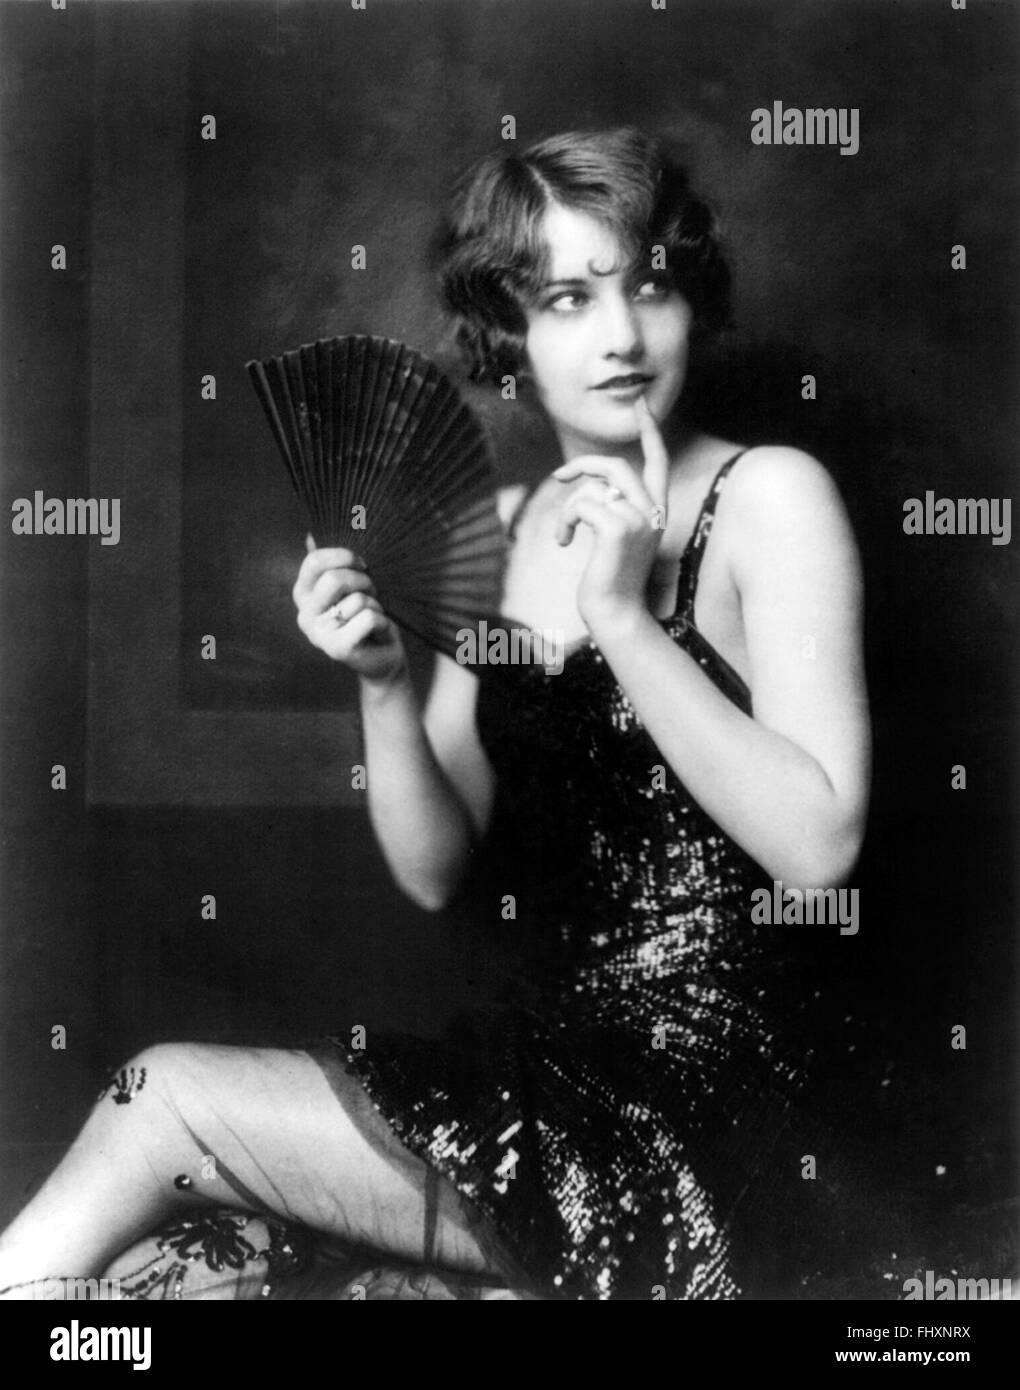 Ziegfeld girl Barbara Stanwyck, showgirl, showgirls - Stock Image